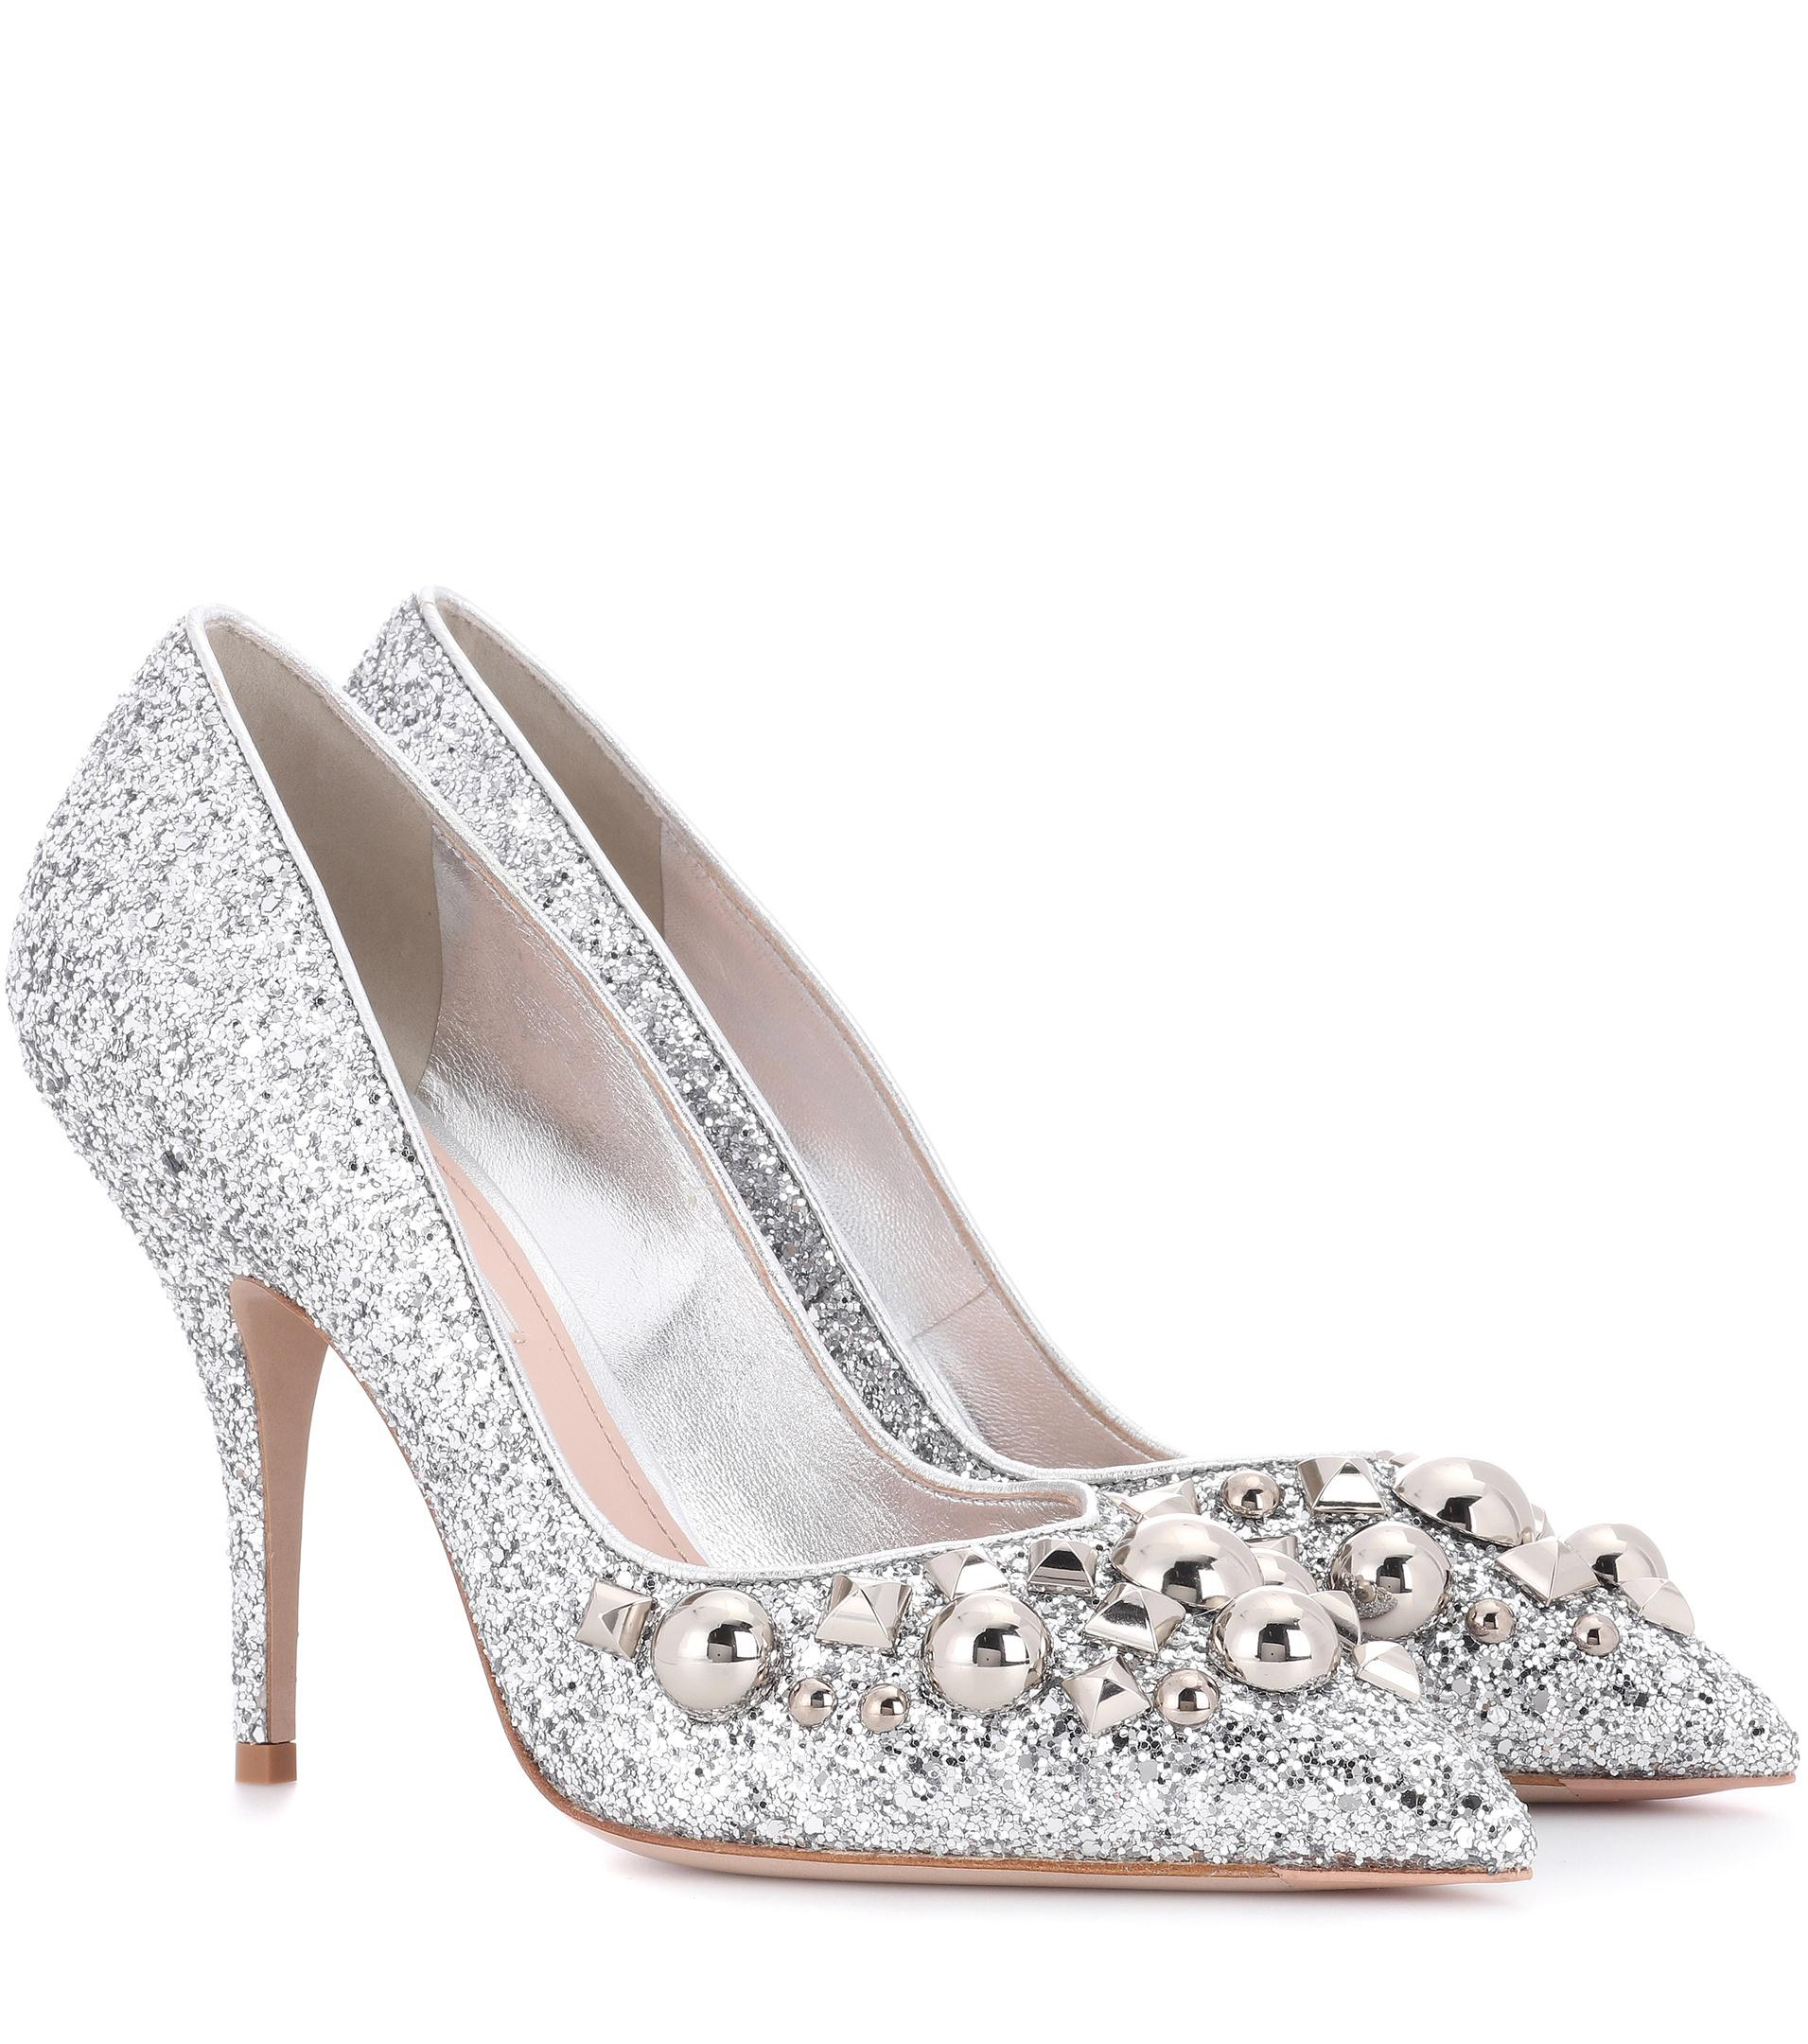 Buy Miu Miu Glitter Shoes